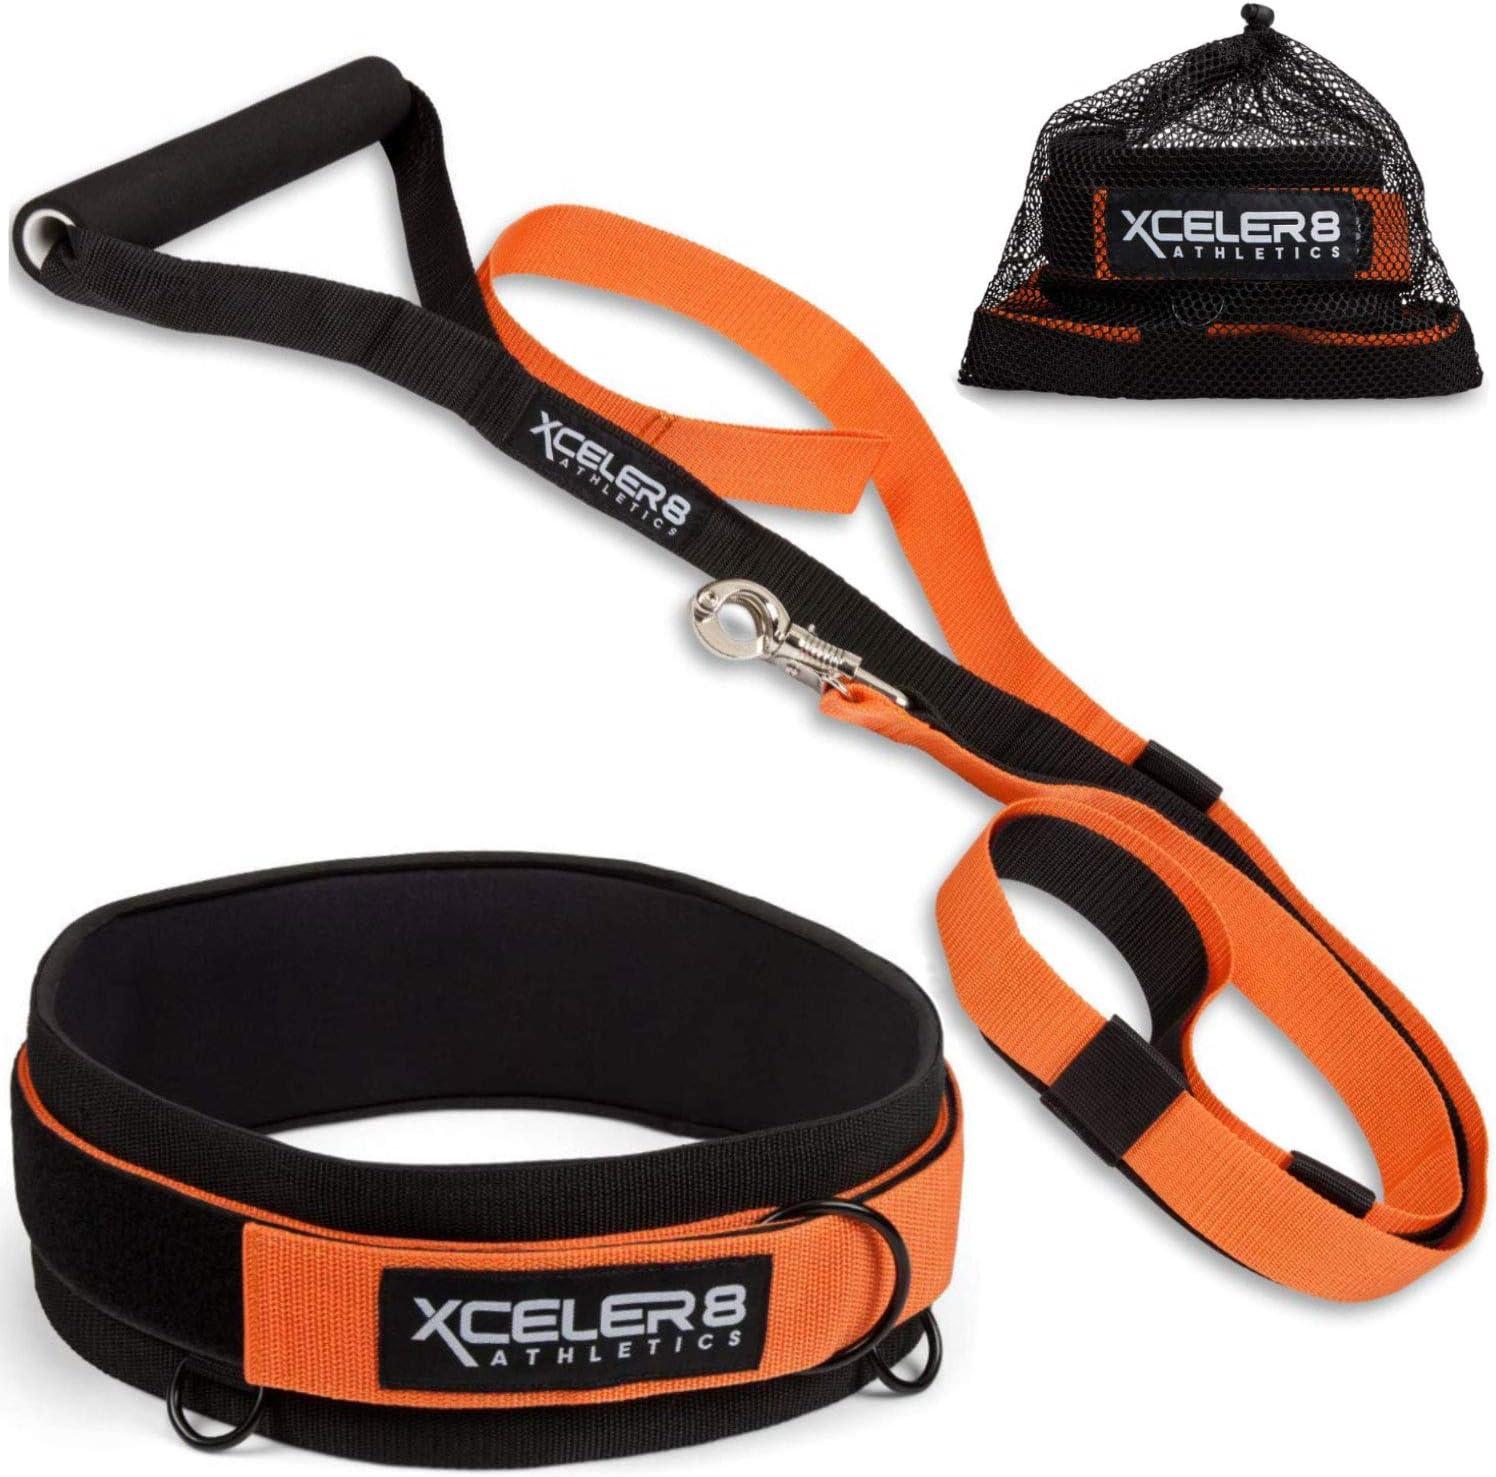 Resistance Bungee Band Adjustable Neoprene Belt Running Training Workout Speed